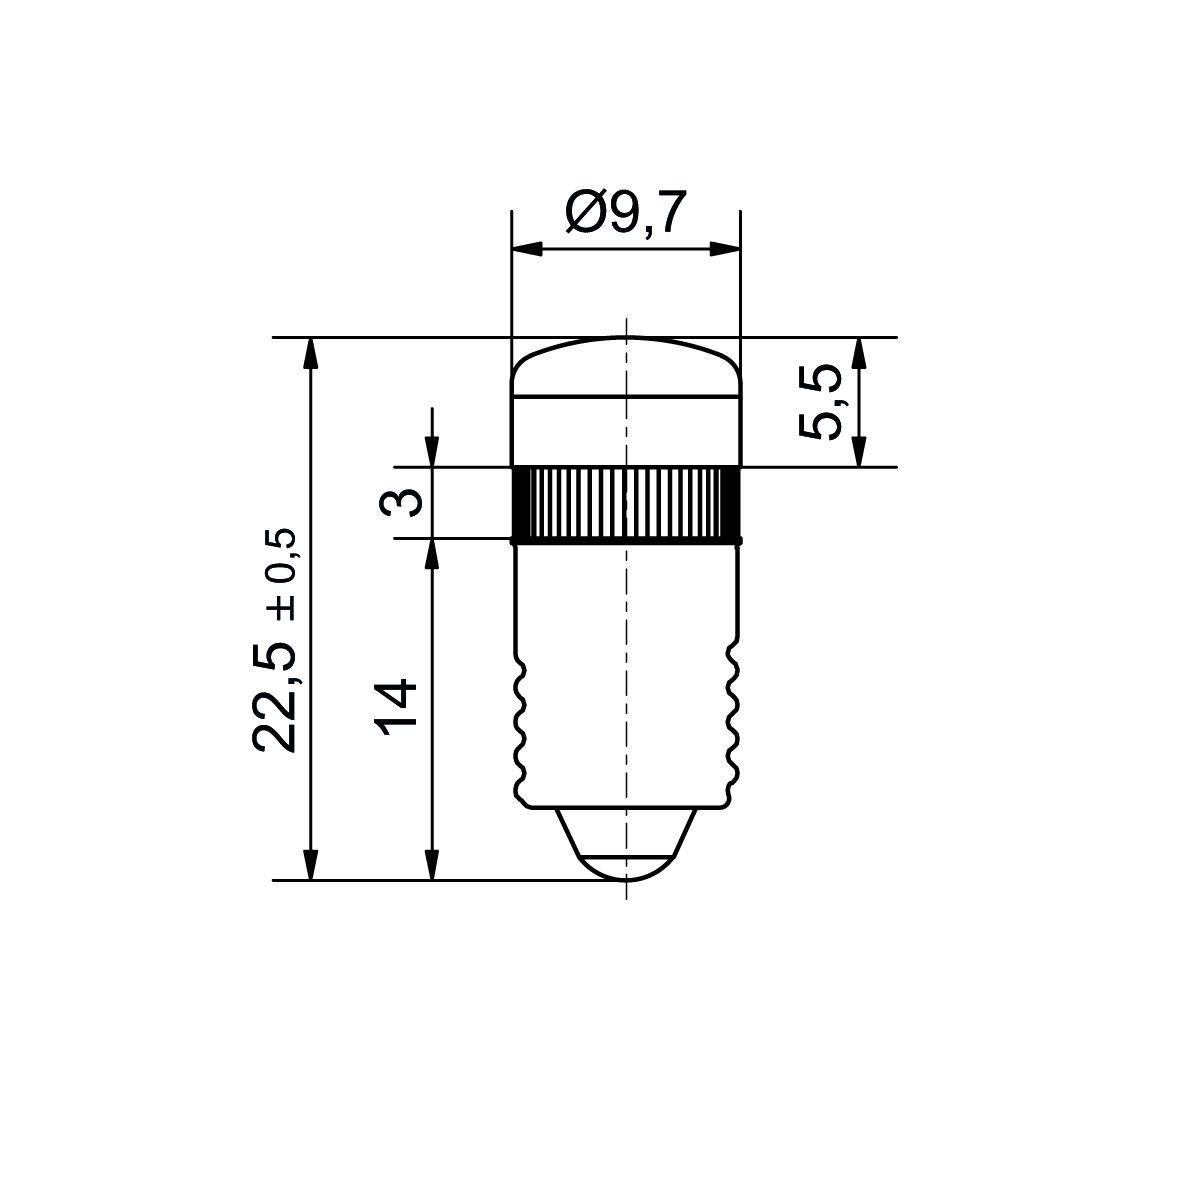 Multi-Look® LED lamp socket E10 up to 60V AC/DC - plan